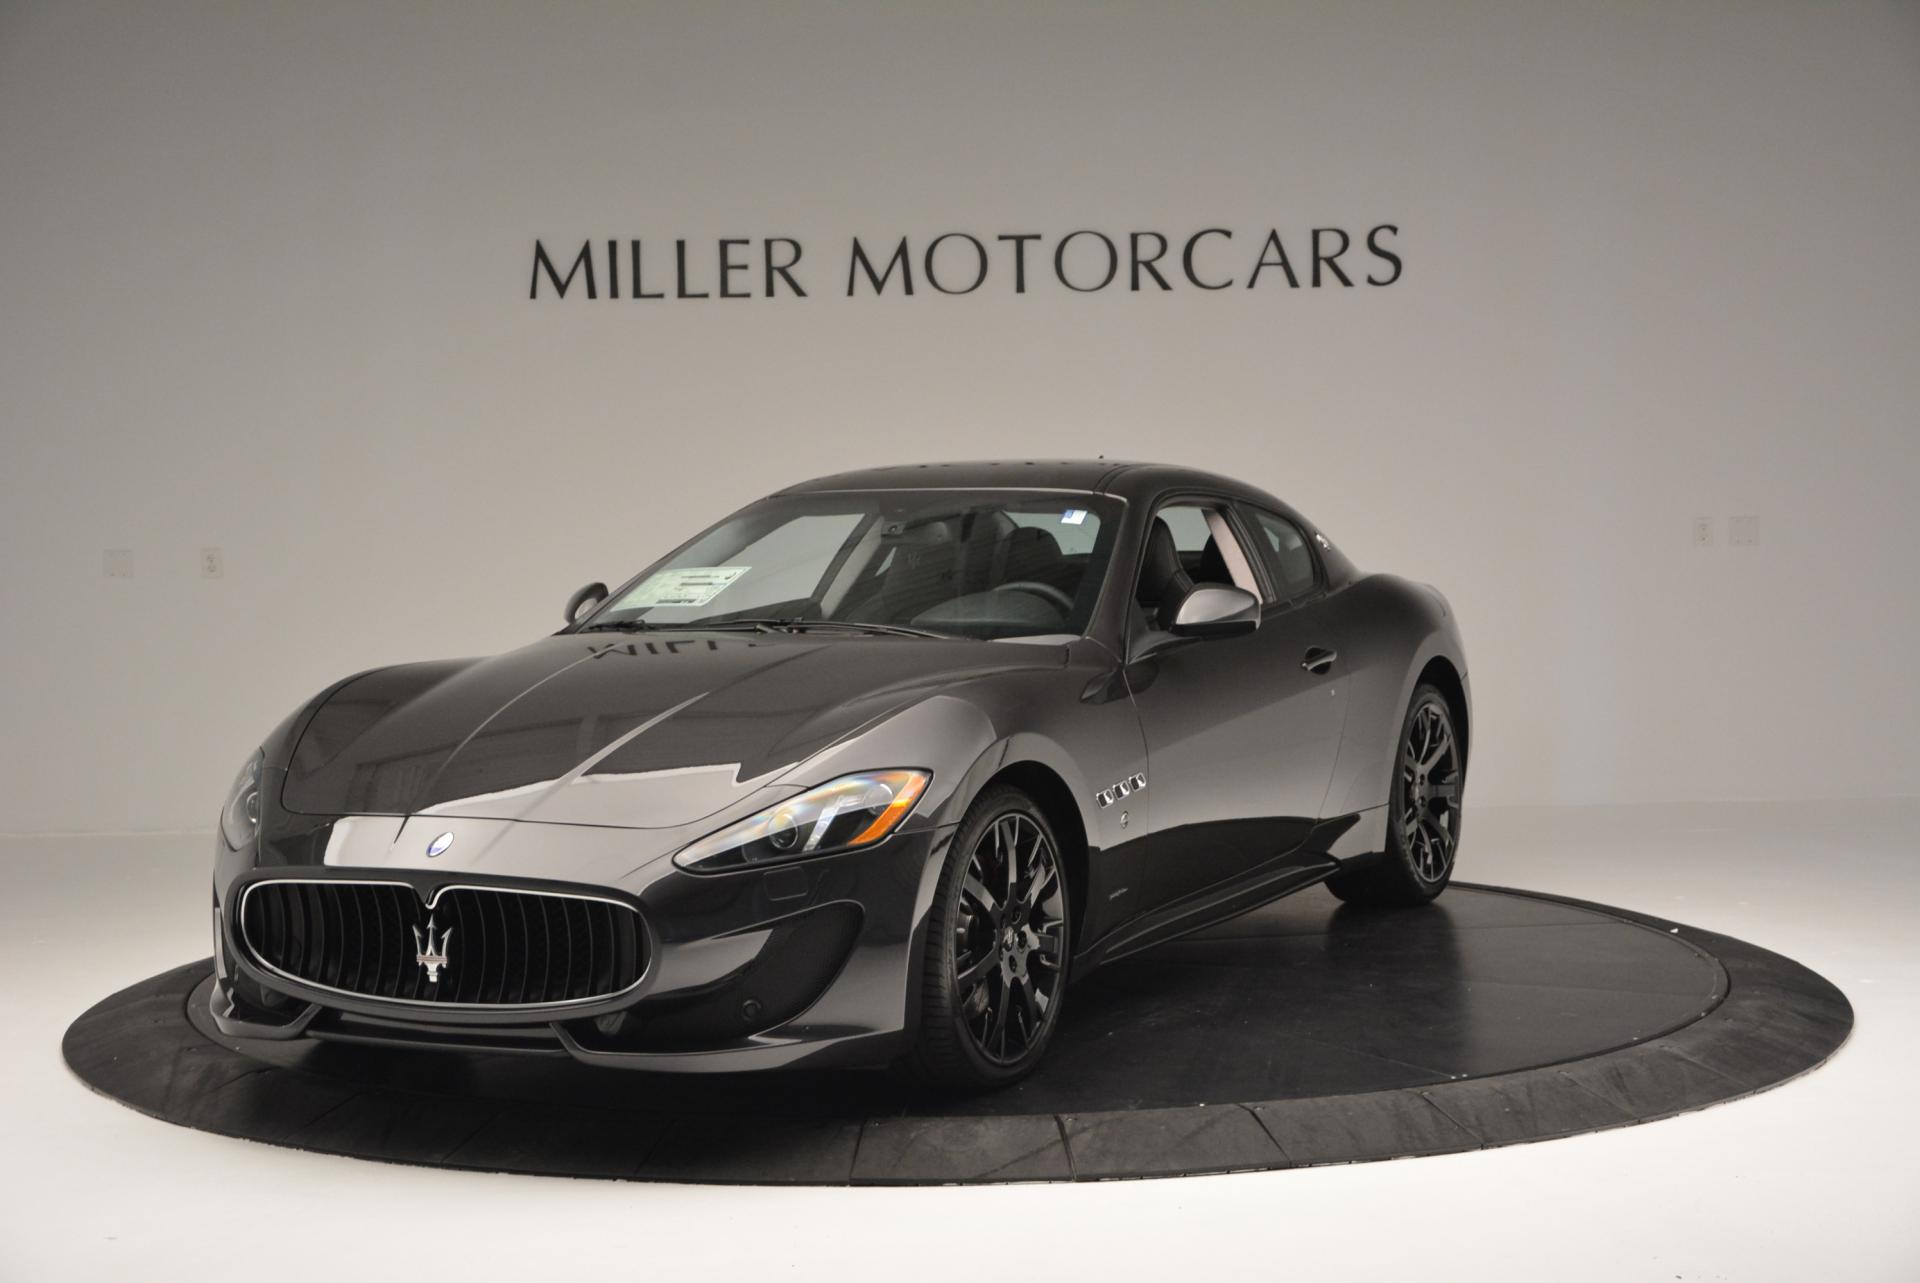 New 2016 Maserati GranTurismo Sport For Sale In Westport, CT 165_main